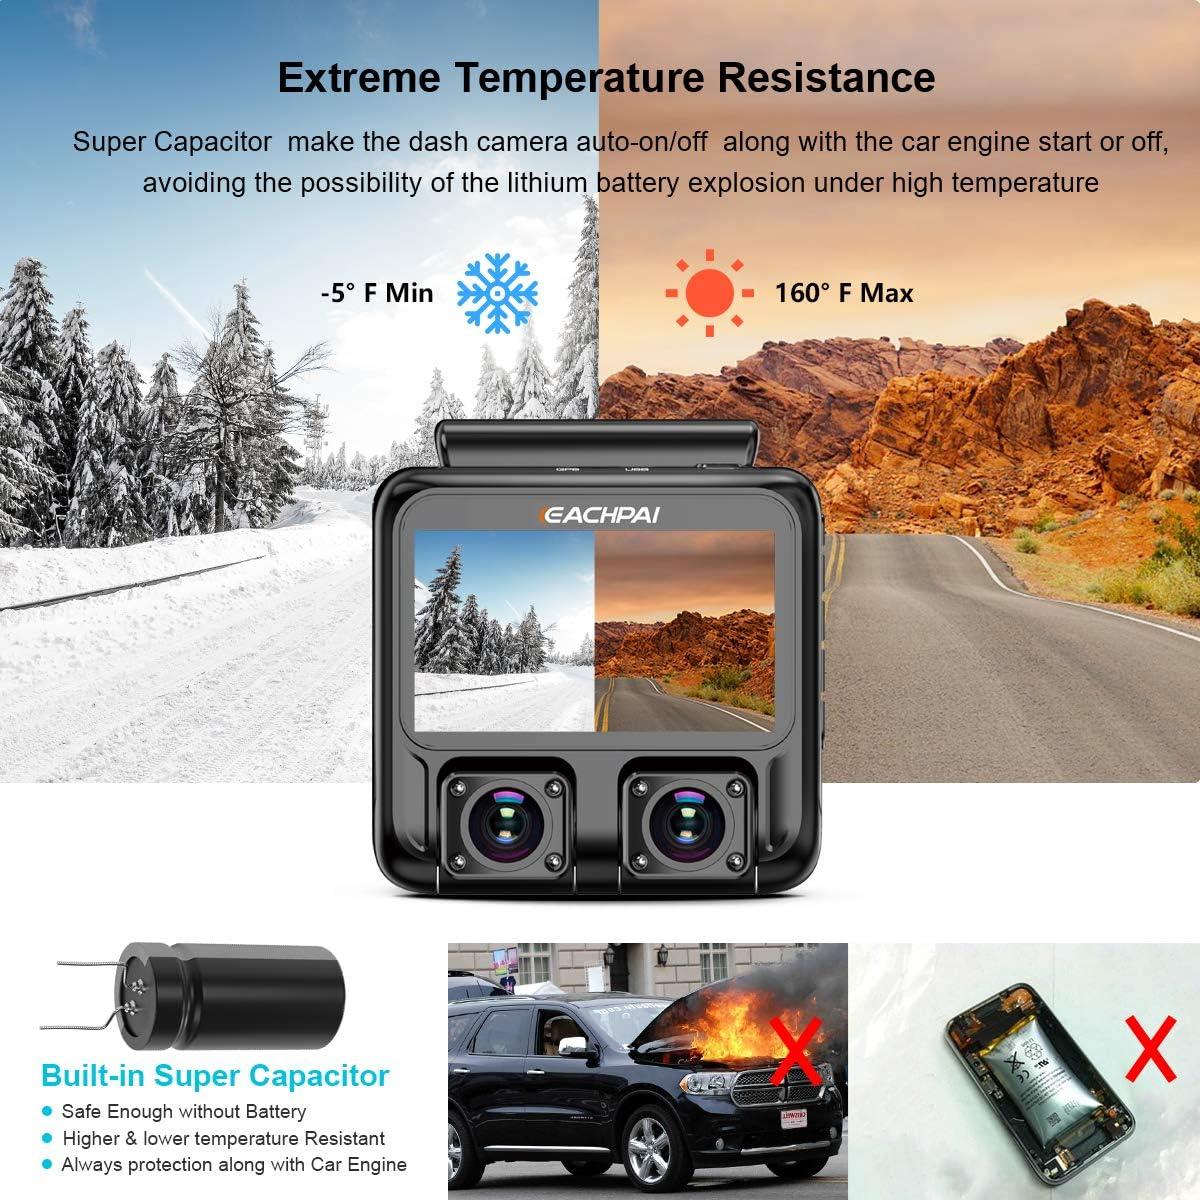 Car Dash Camera 4K EACHPAI X100 Plus Dash Cam Dual Single 4K Front//Dual 1080P,3 Car Camera for Cars with WI-FI GPS,IR Night Vision,Parking Mode,G-Sensor,Motion Detector,Loop Recording,WDR